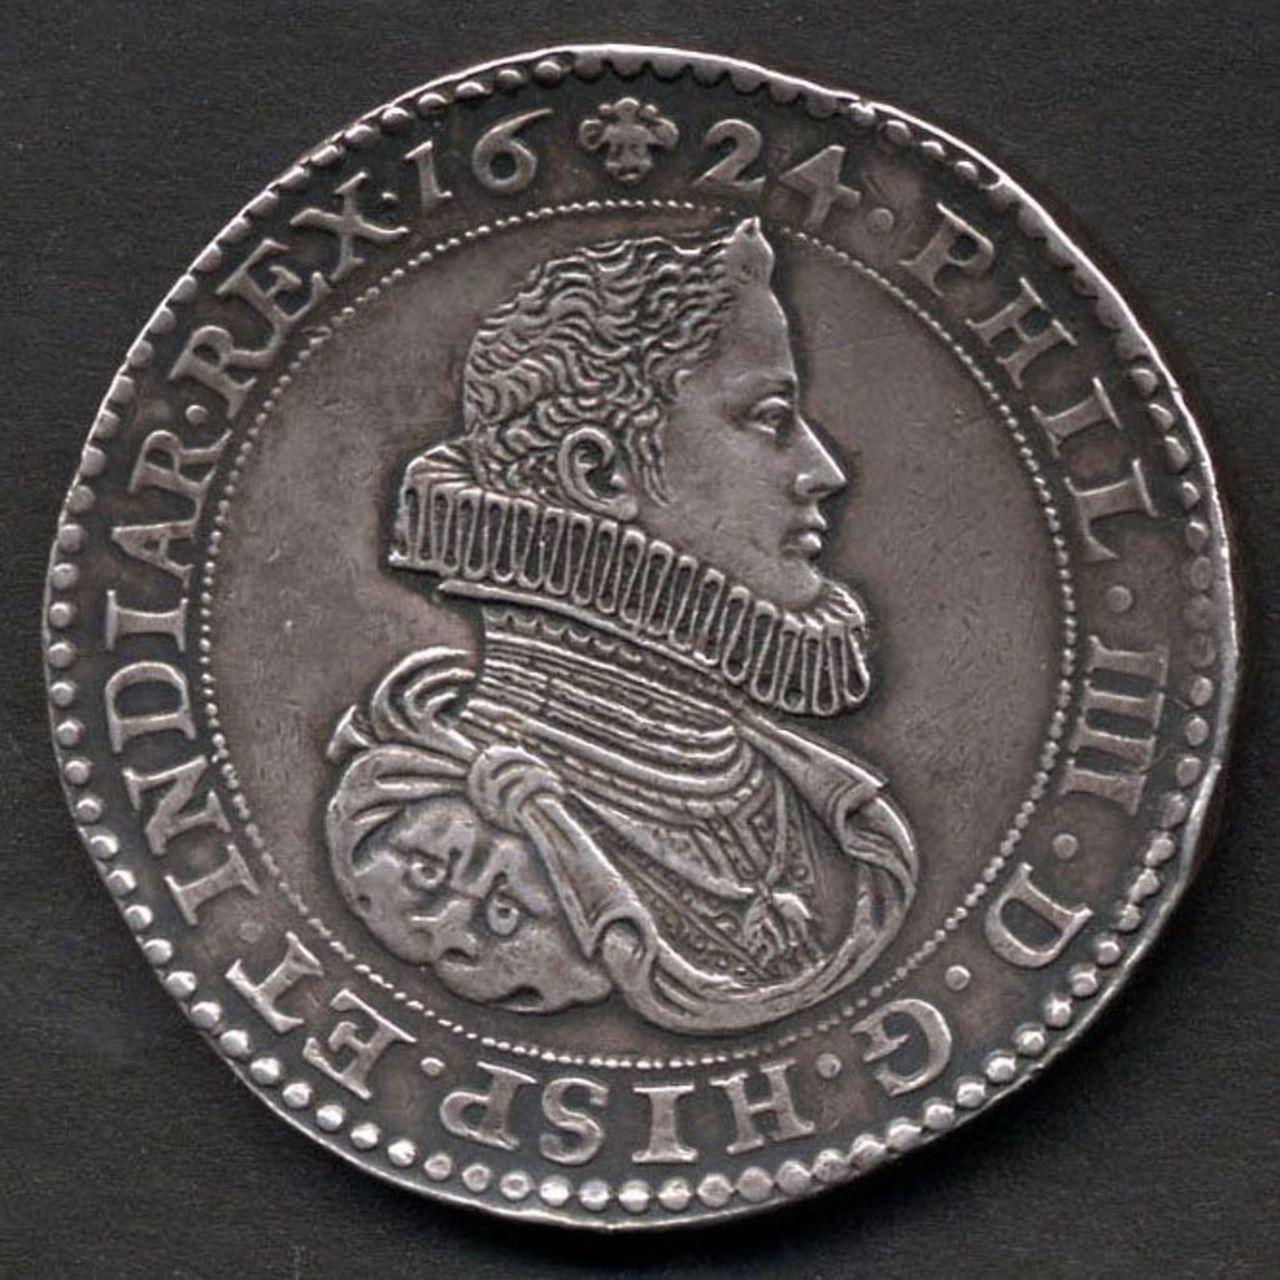 Doble Ducatón de Felipe IIII. 1623. Bruselas. - Página 2 2_1